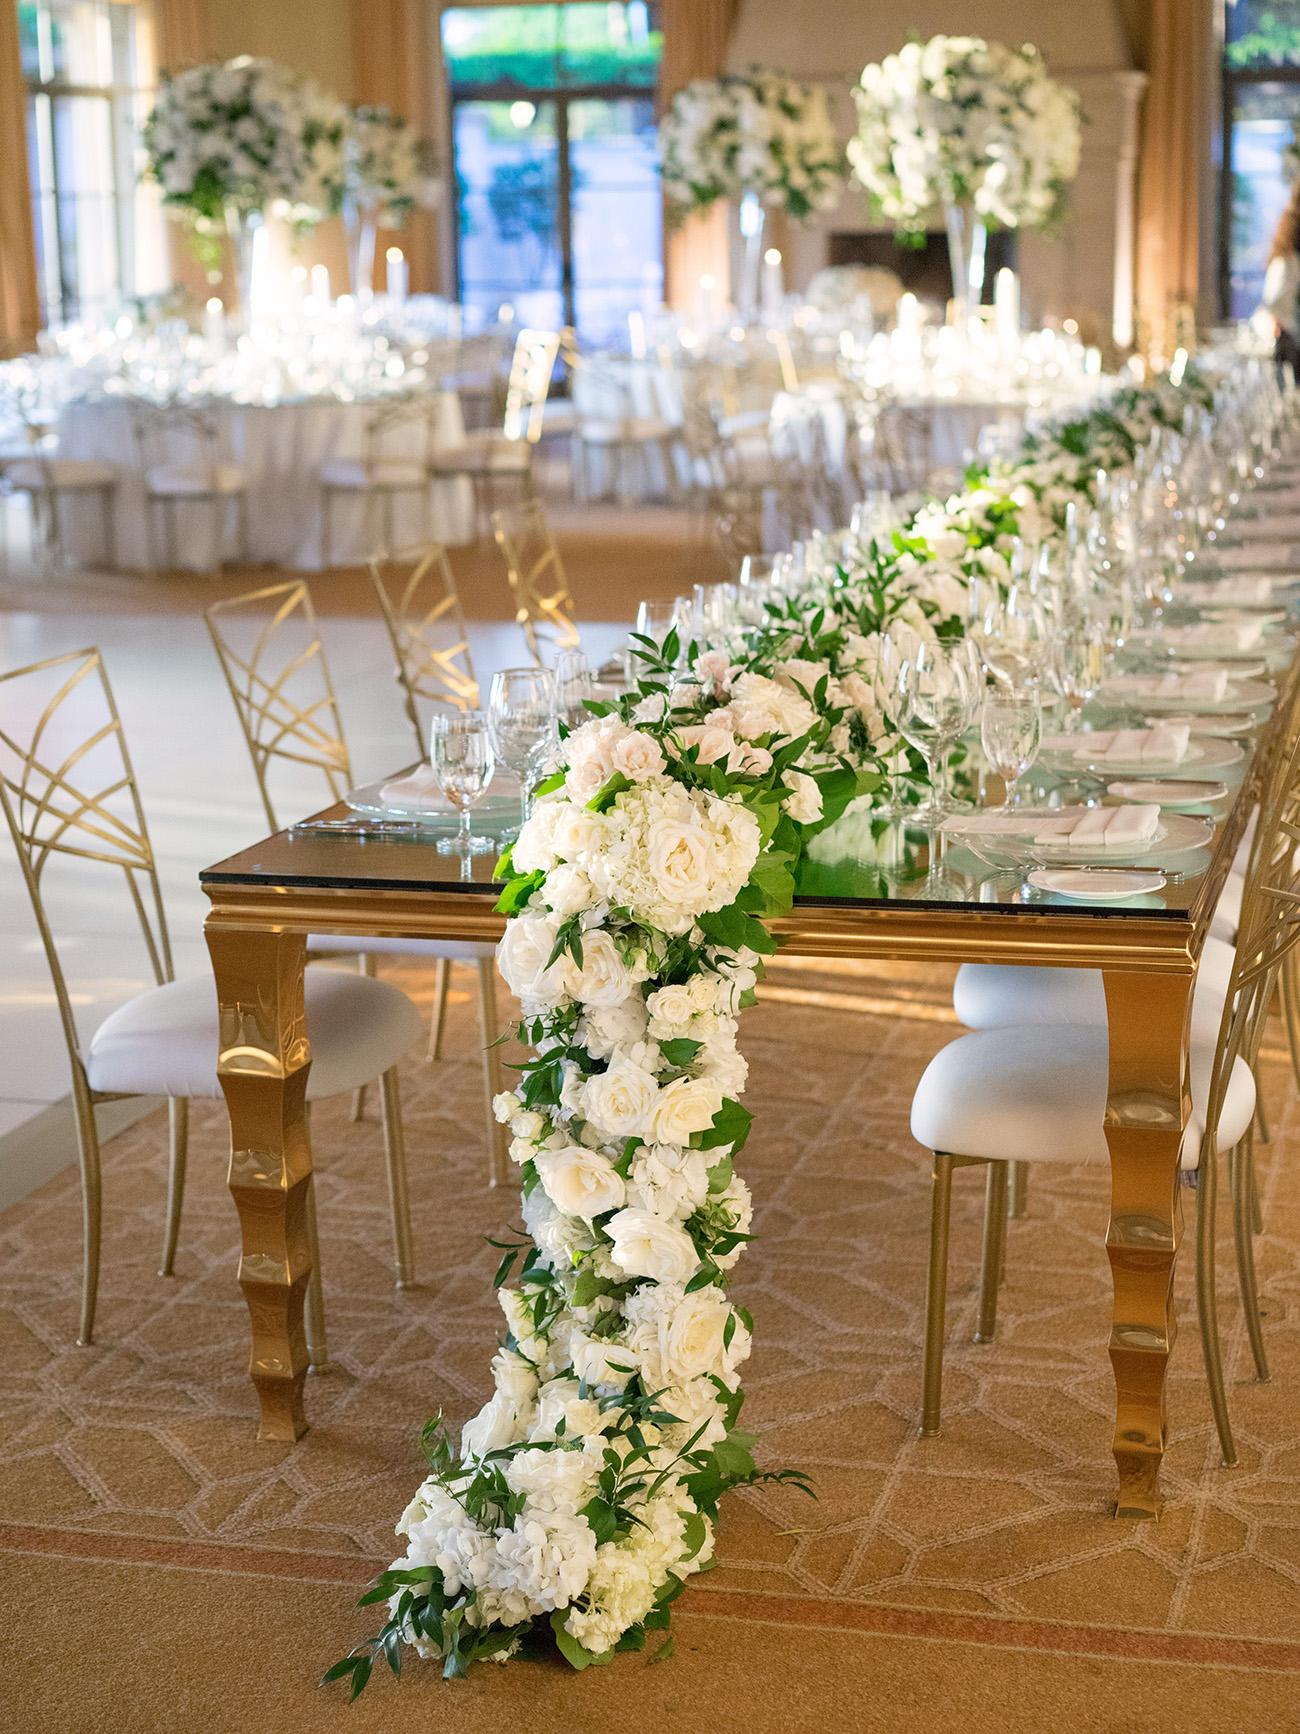 lane_ditoe_weddings_peleican_hill_wedding710.jpg